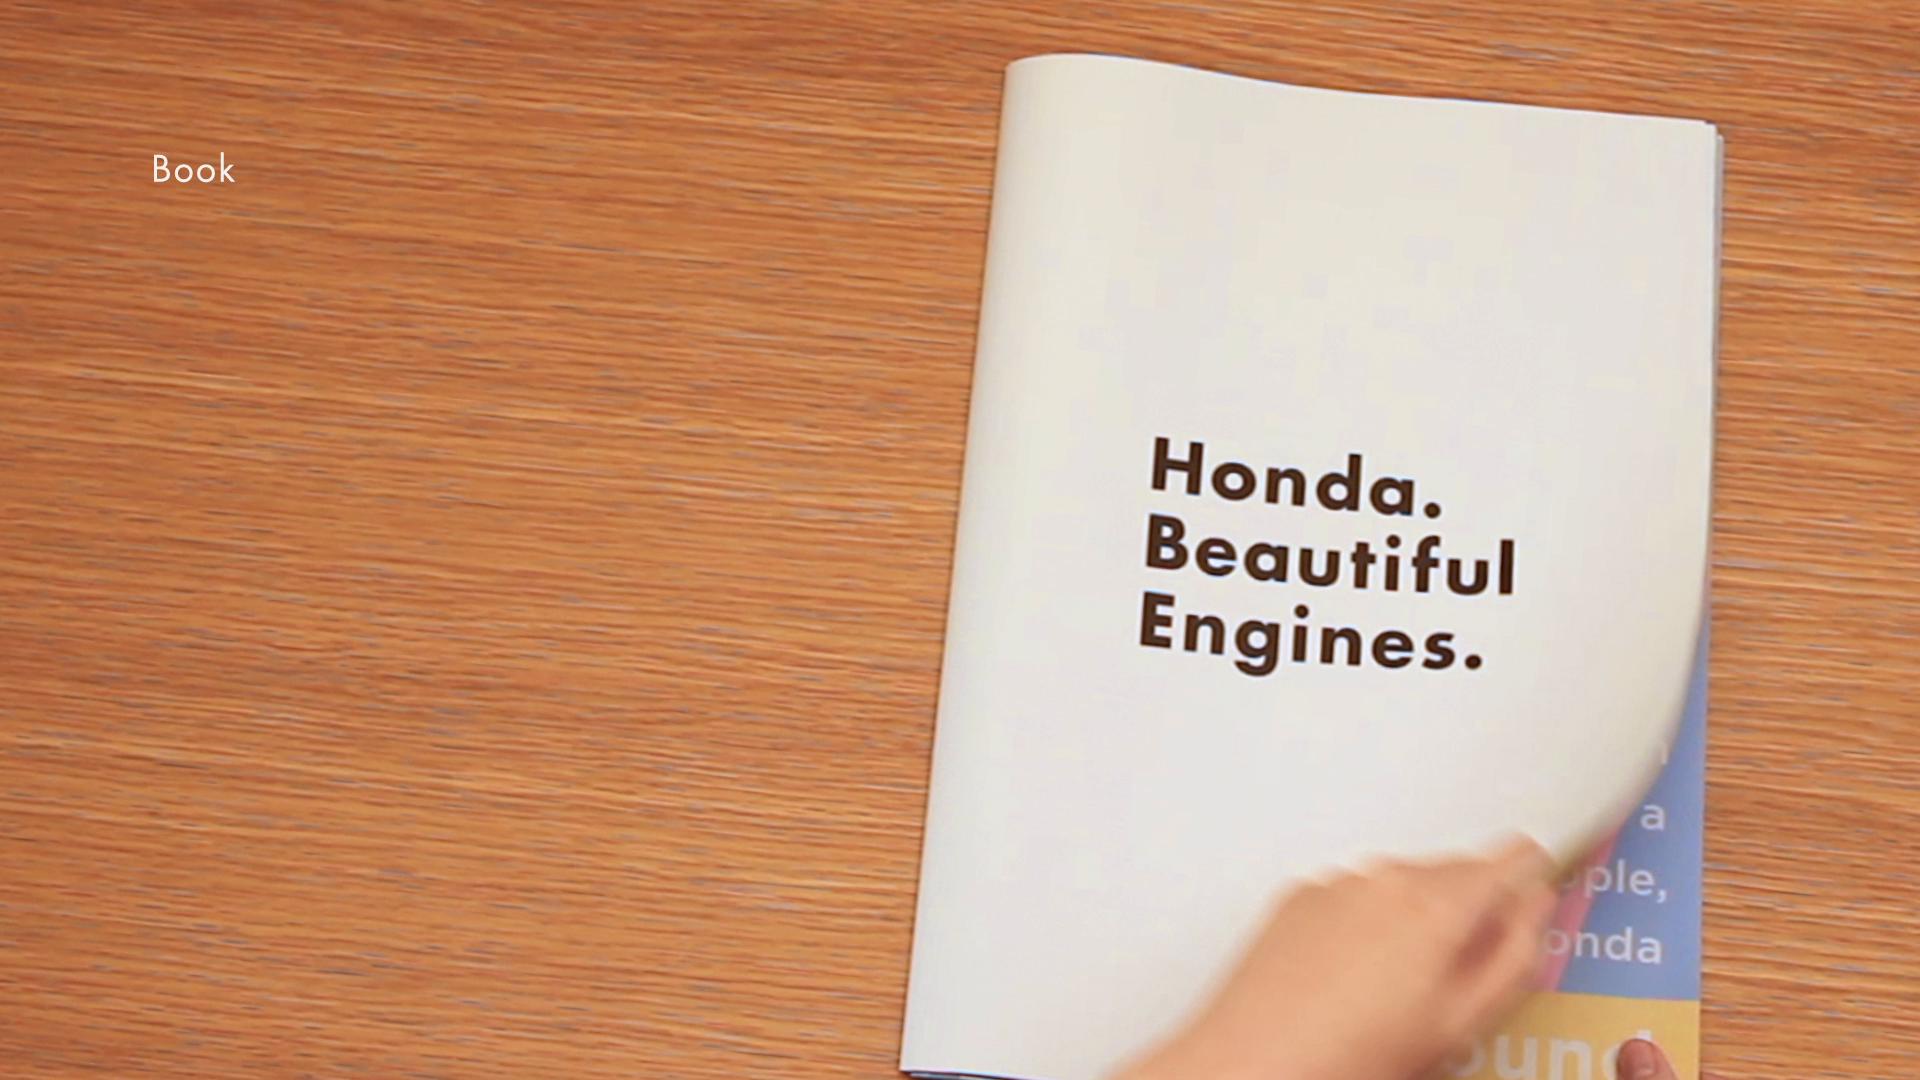 Thumbnail for Honda.Beautiful Engines.